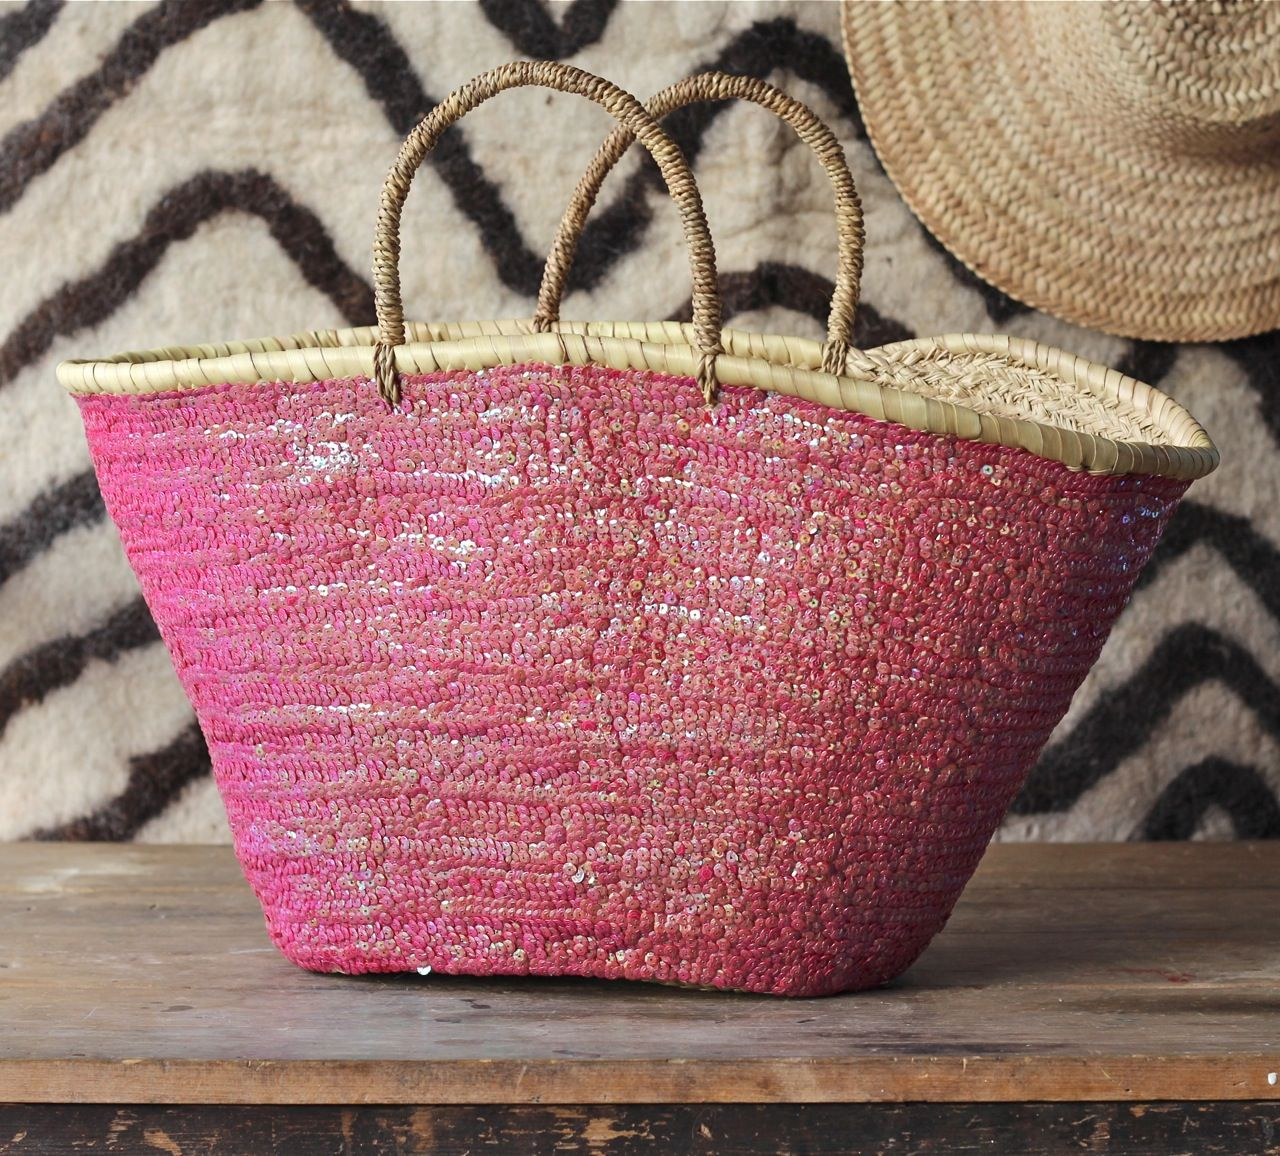 Sequin market basket